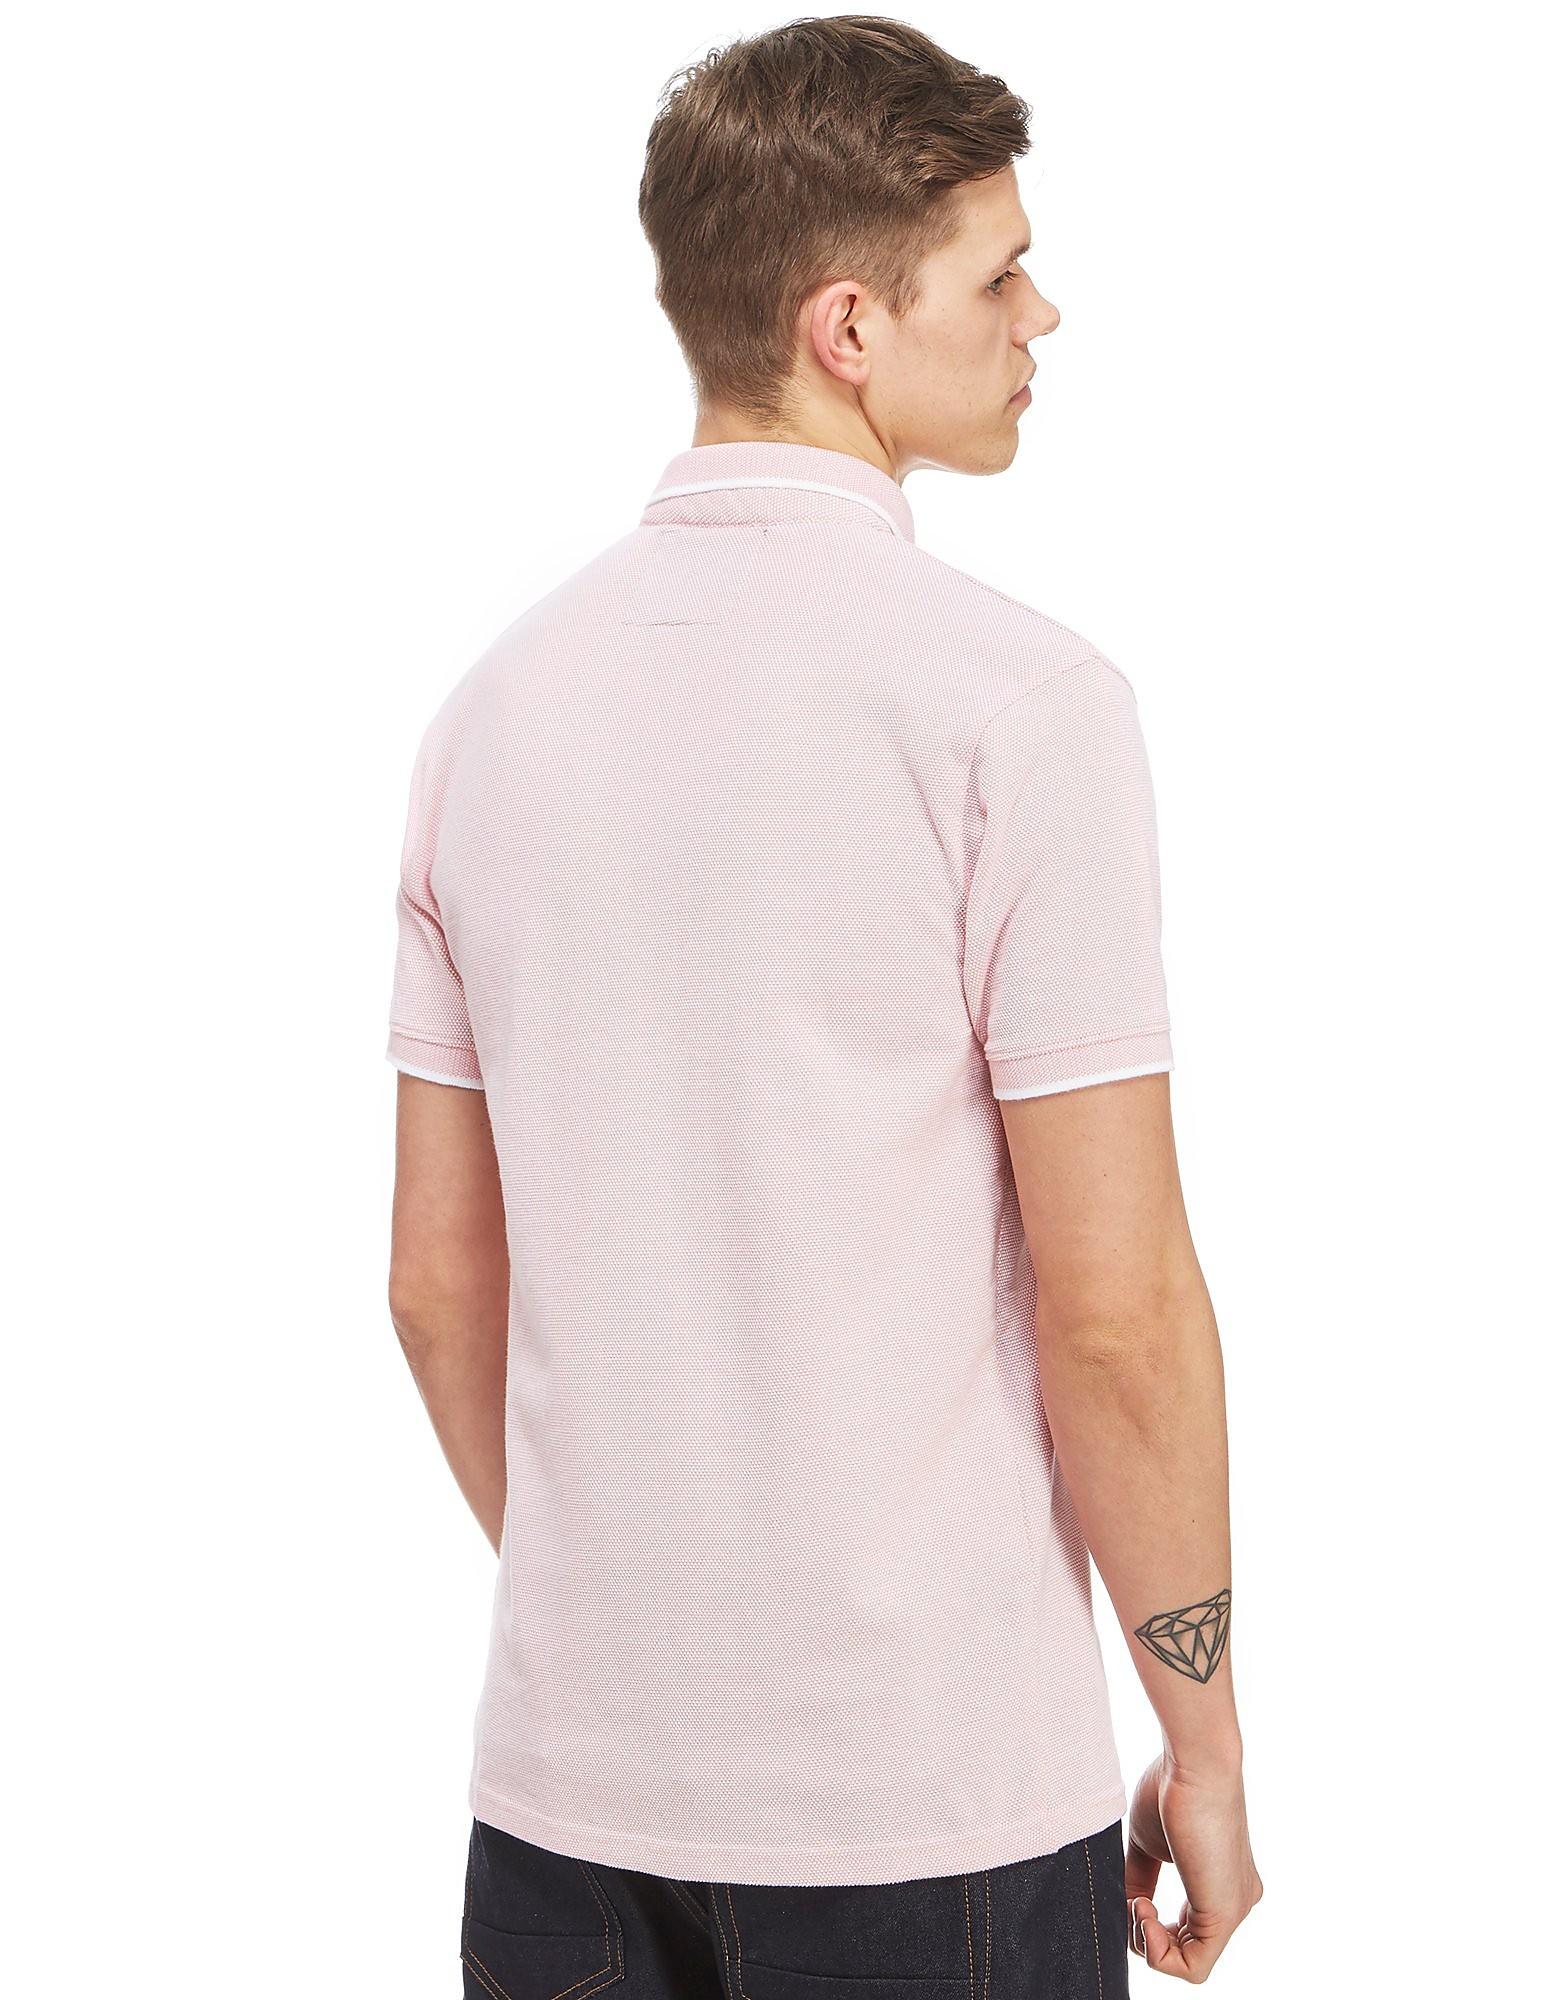 Brookhaven Pique Polo Shirt